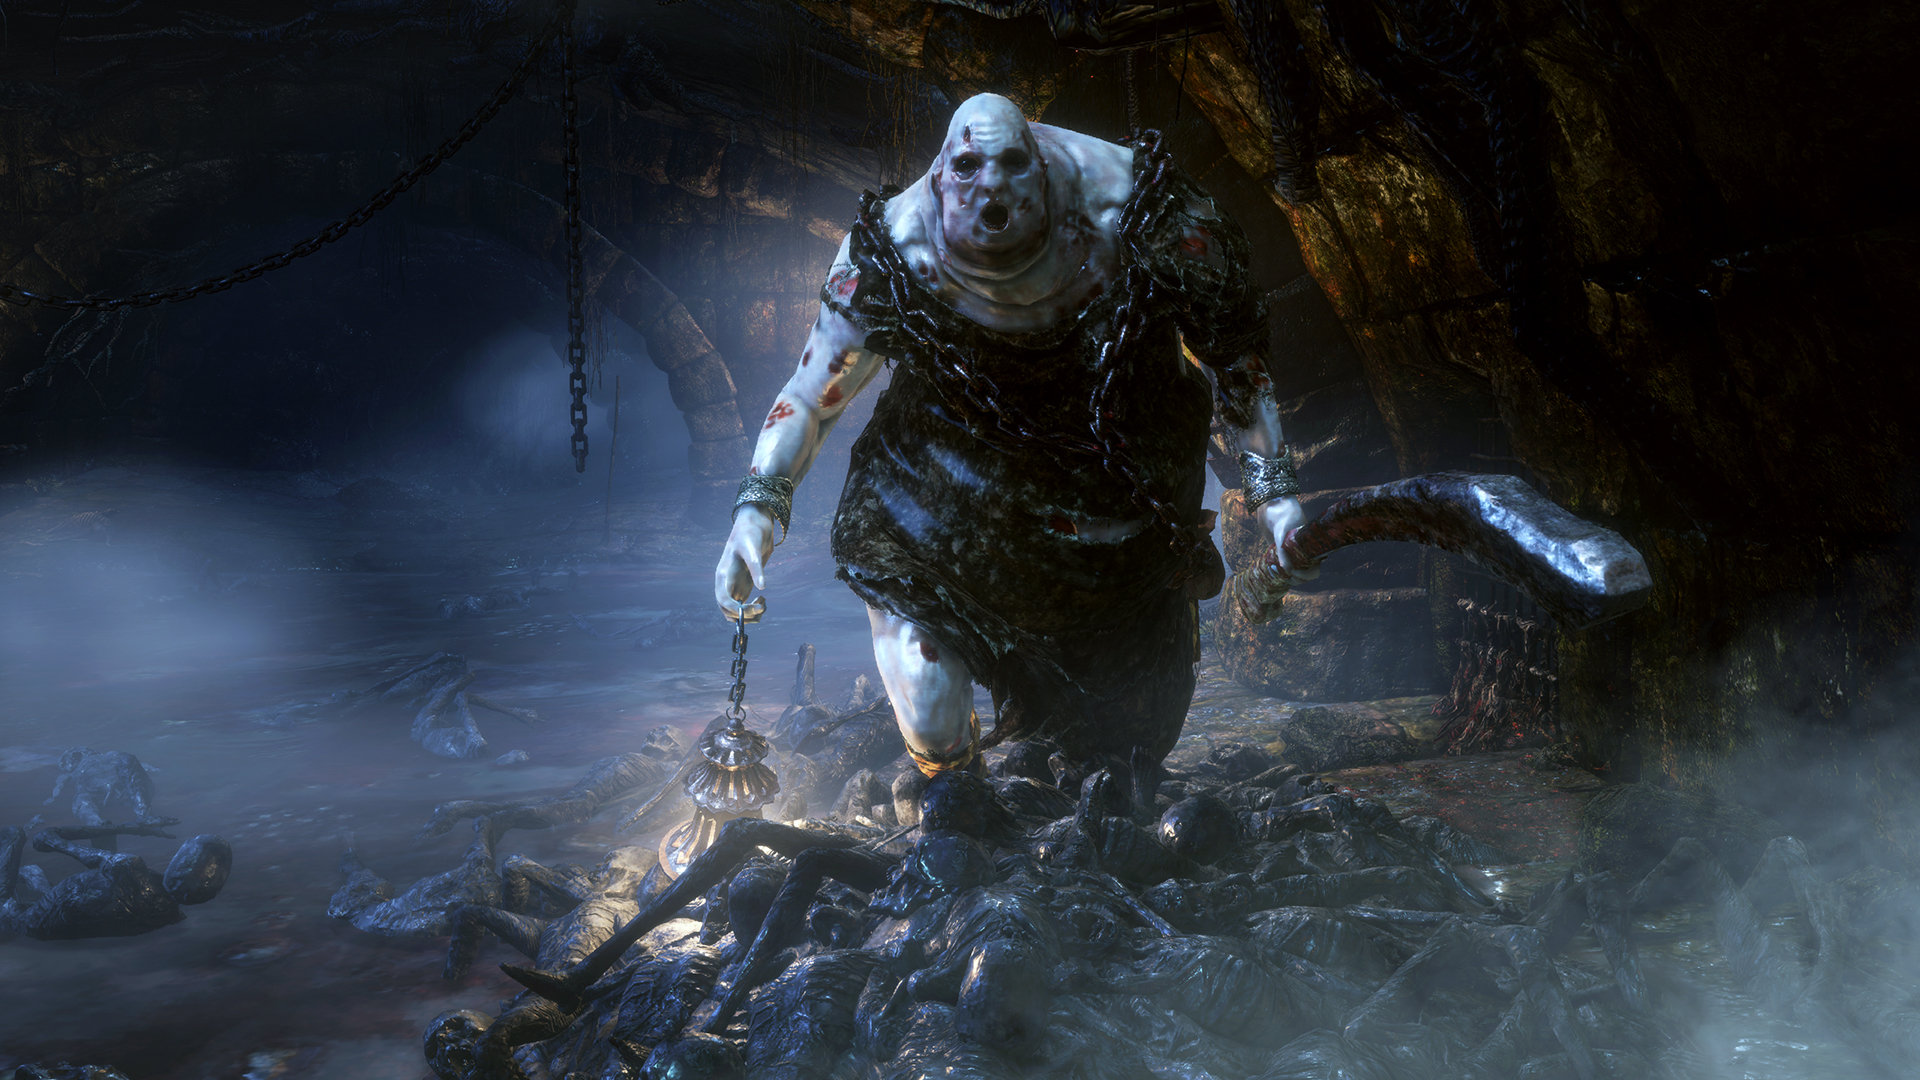 bloodborne-chalice-dungeon-protector-scr